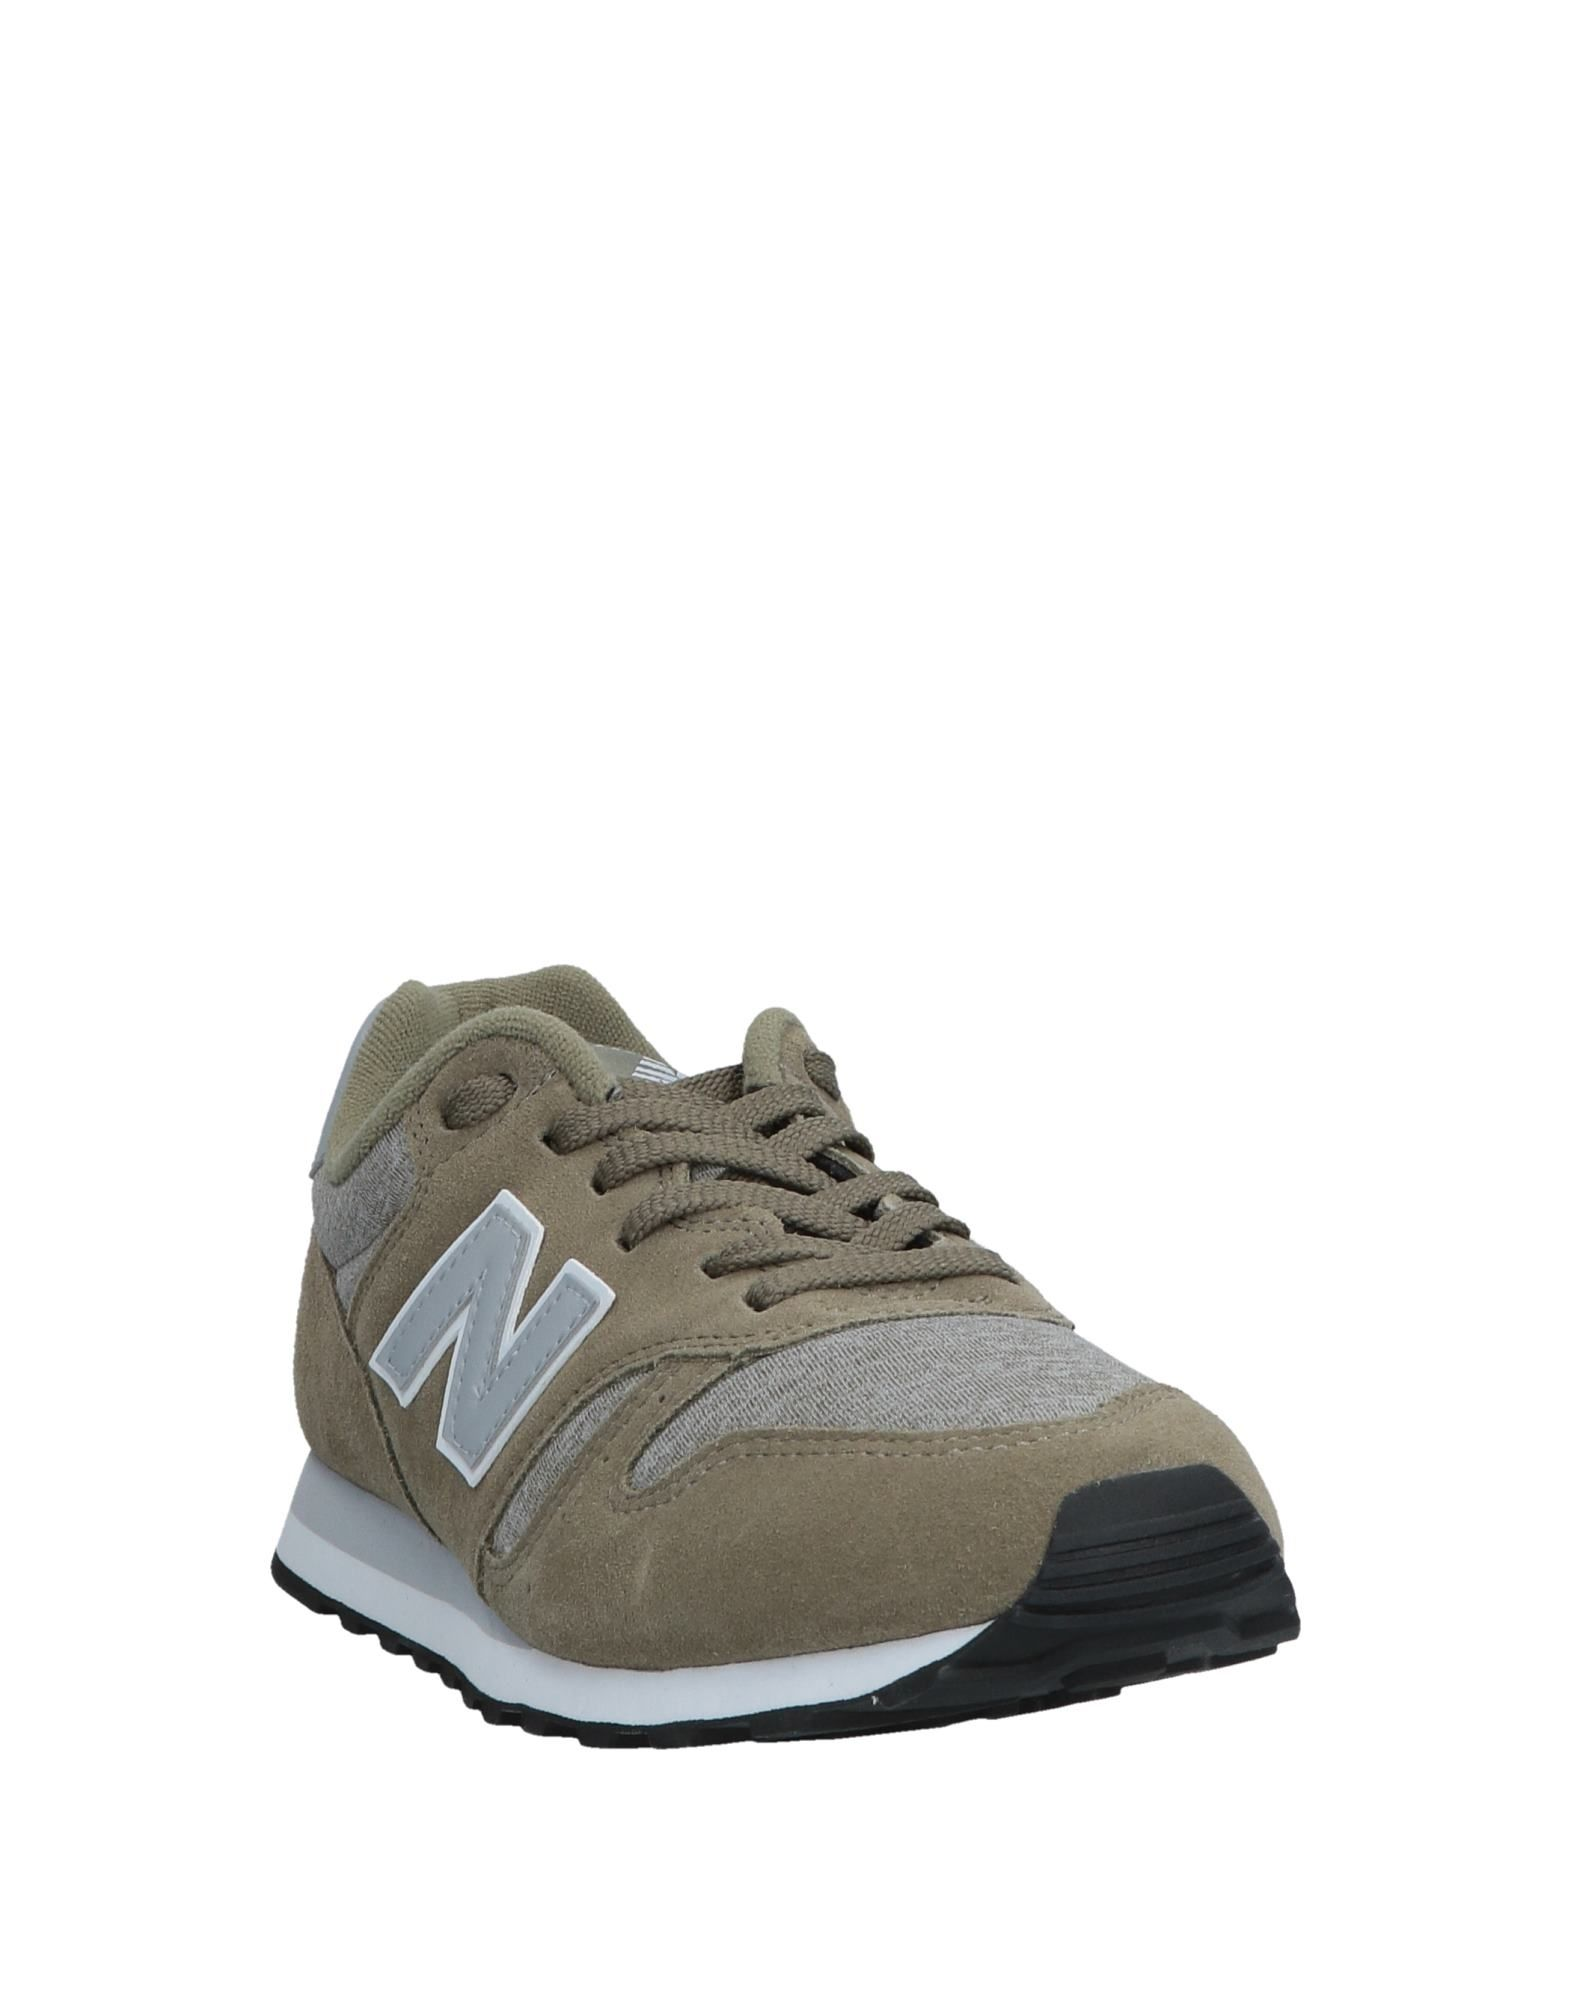 Rabatt echte Herren Schuhe New Balance Turnschuhes Herren echte 11570381XM 2b1594